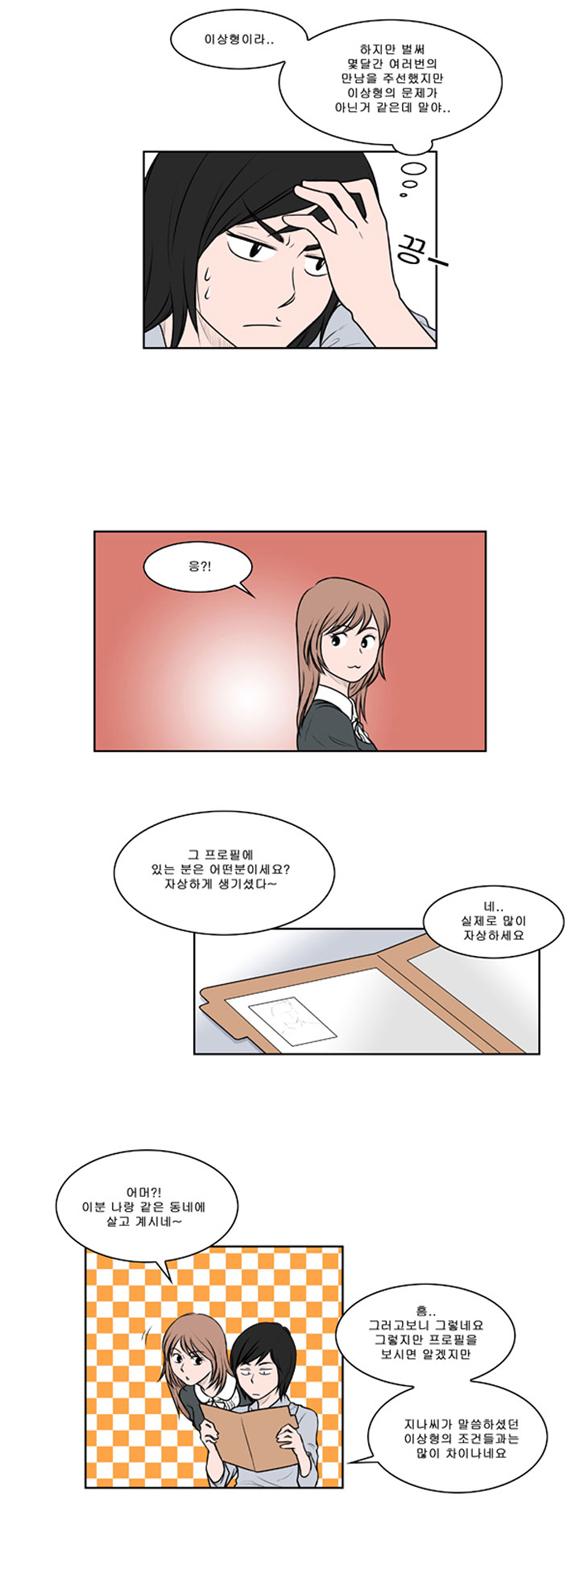 duocartoon_04_02.jpg